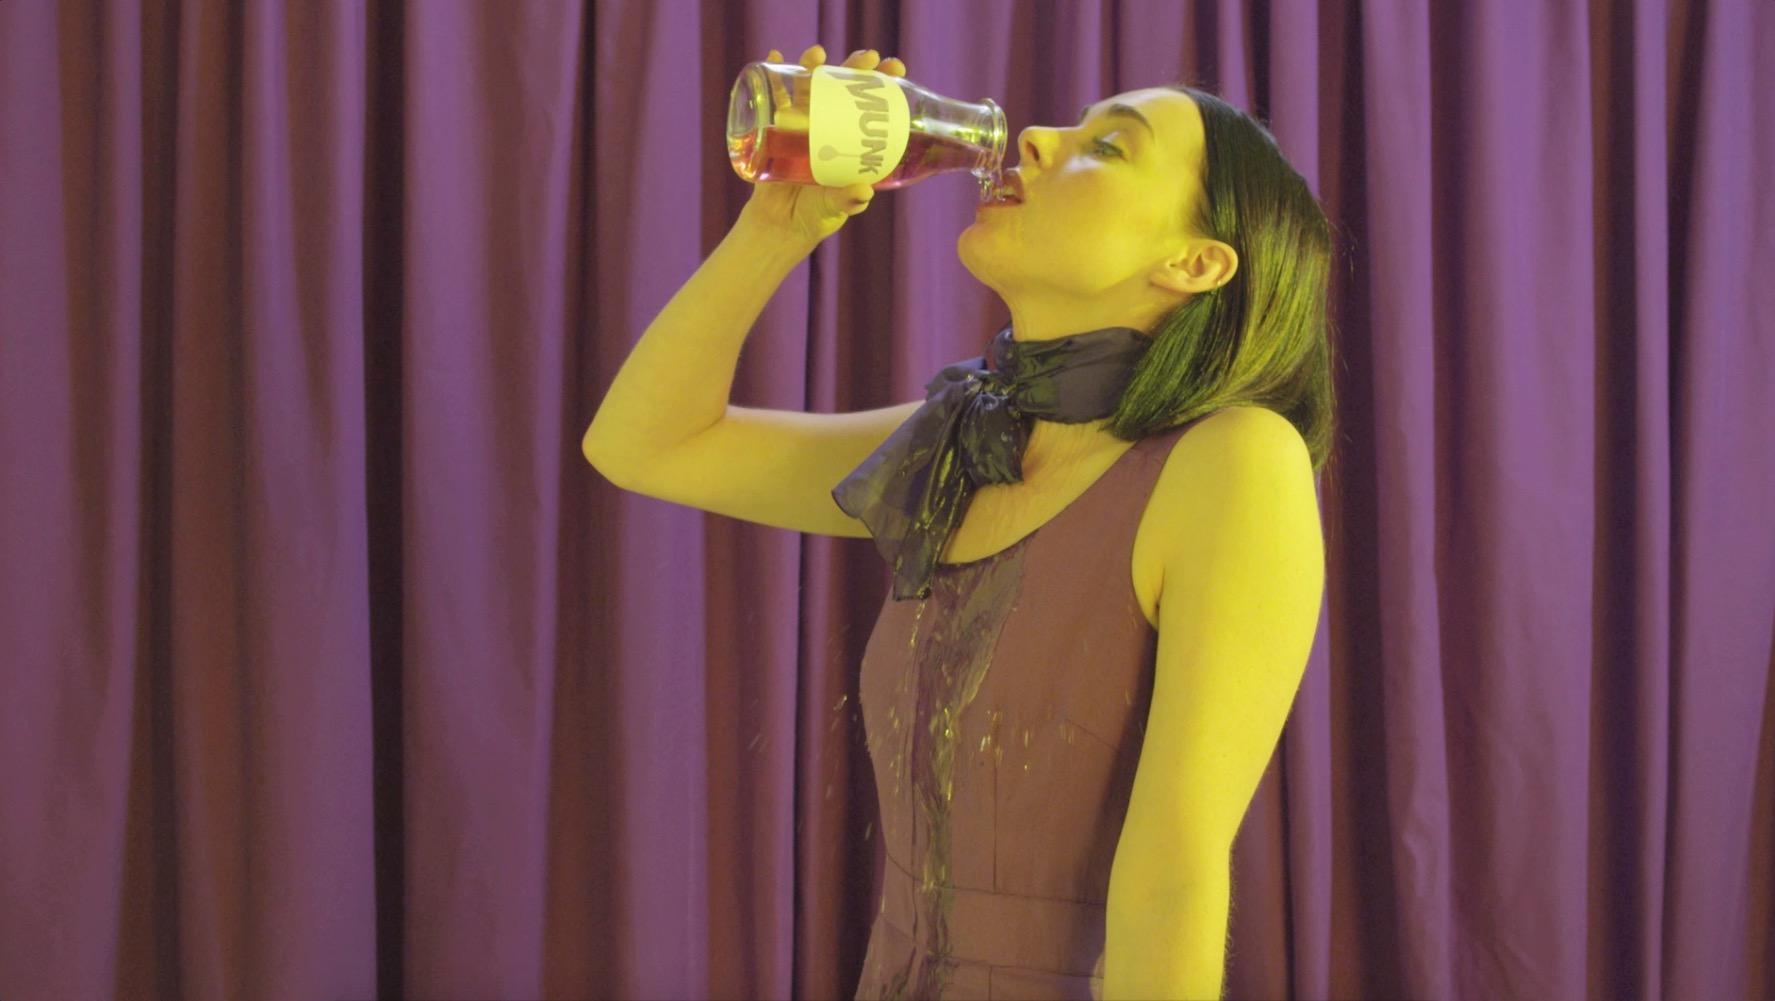 MUNK - HAPPINESS JUICE  2014 Jade Mortimer Films / dir: Jade Mortimer